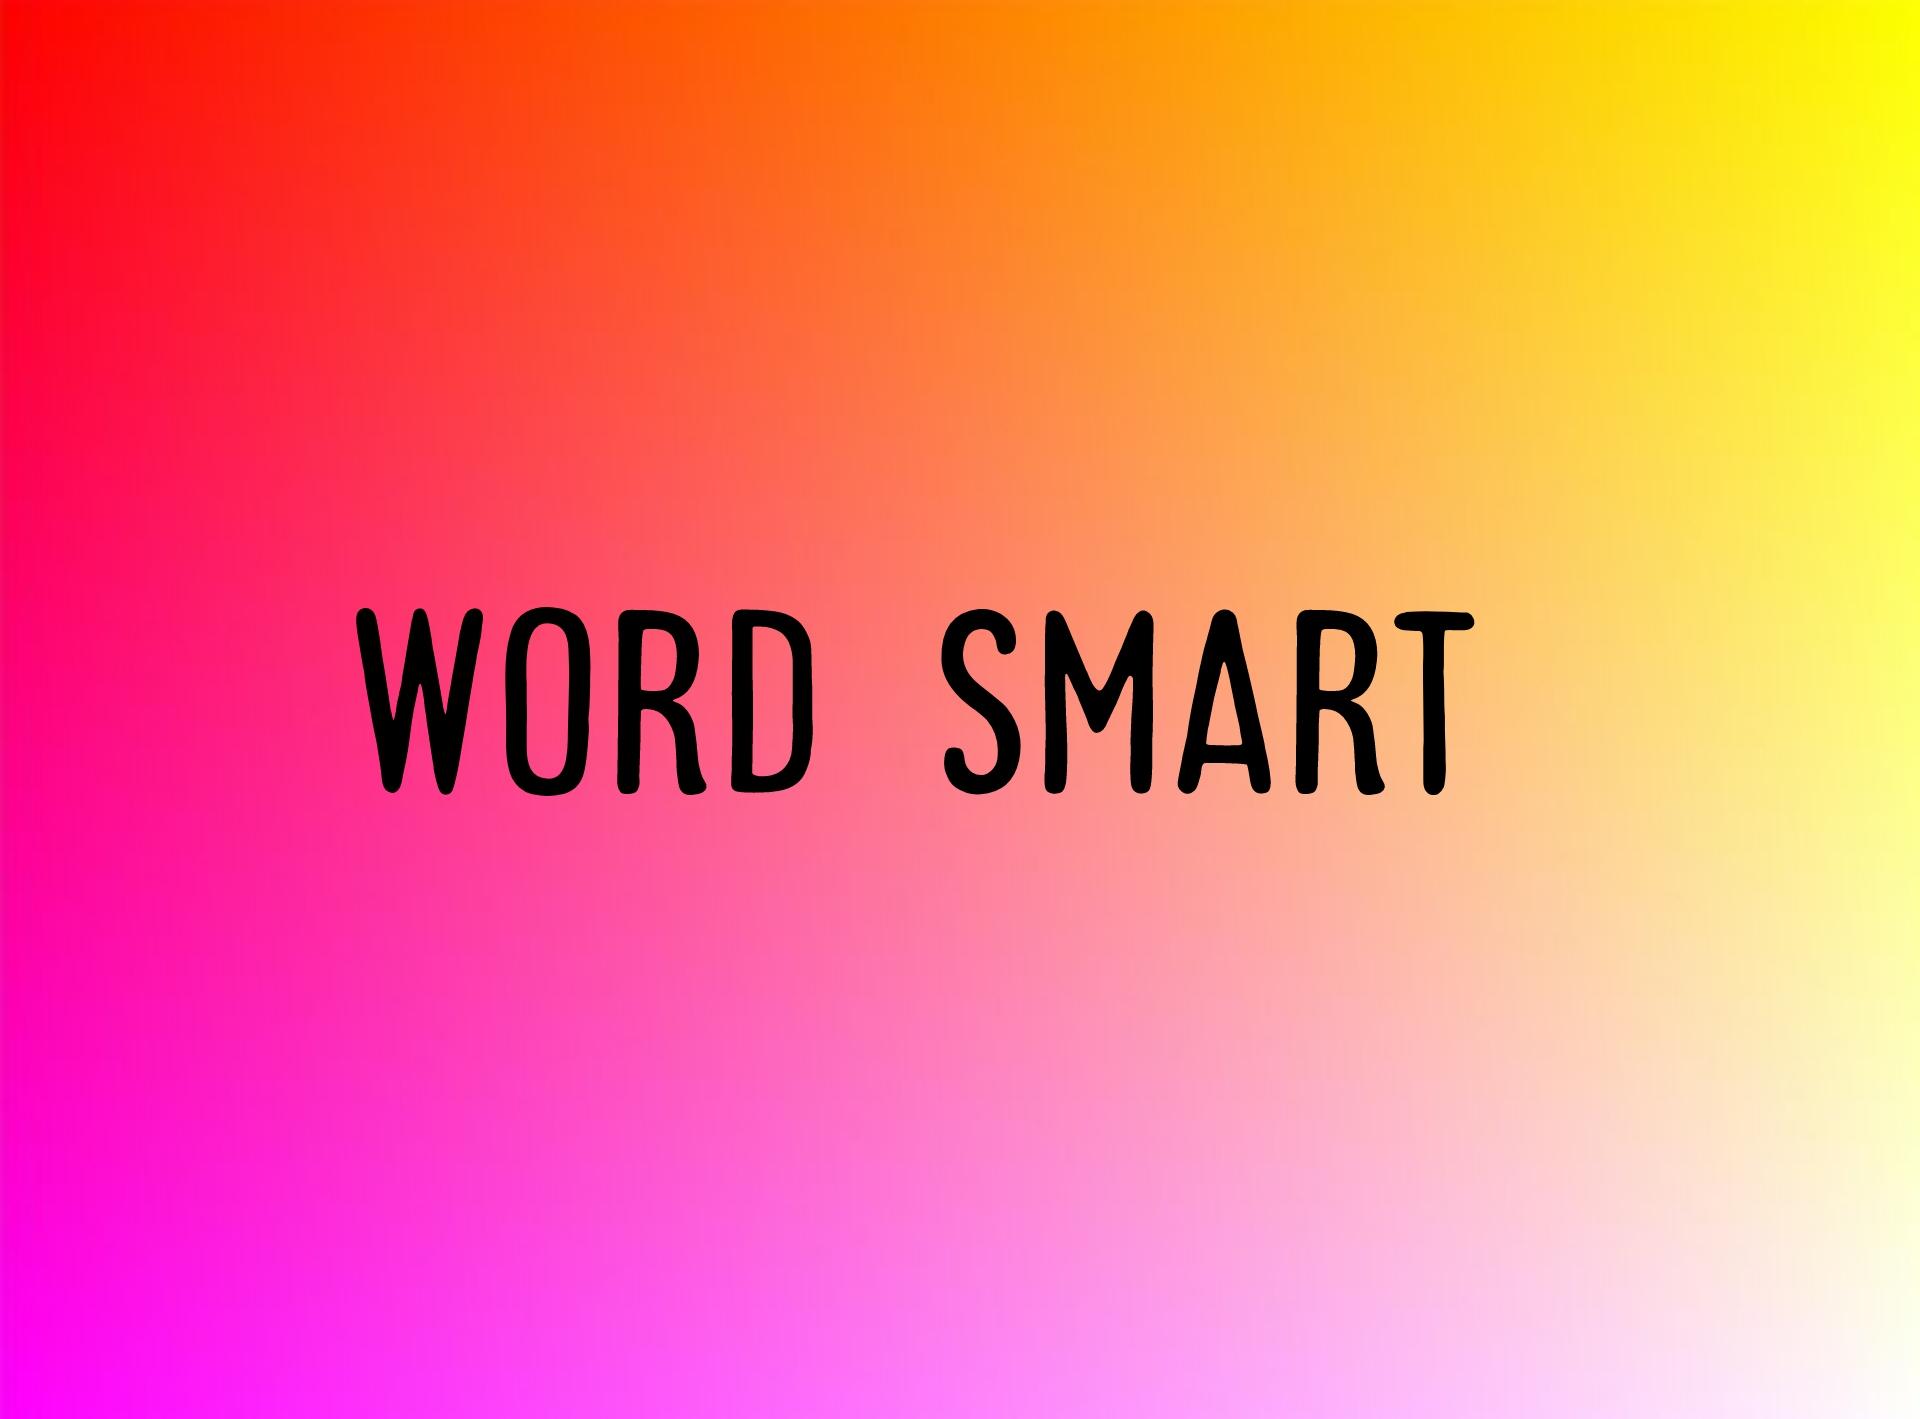 word smart  book pdf, word smart  book pdf download, word smart bangla pdf